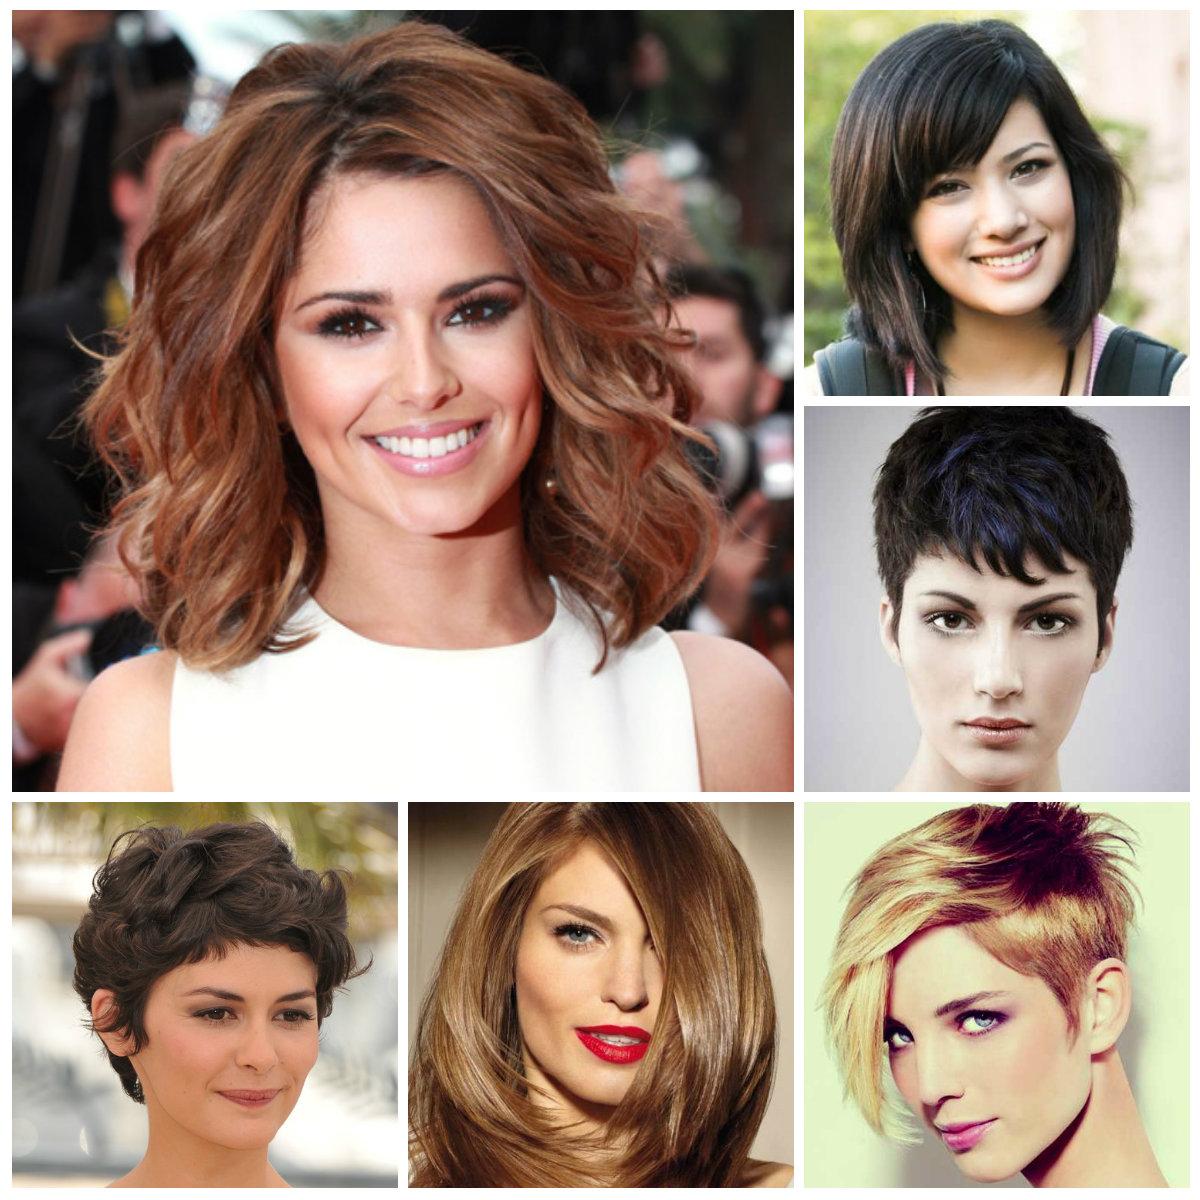 Medium And Short Haircuts For Thick Hair | Hairstyles For Women 2019 For Medium To Short Haircuts For Thick Hair (View 6 of 25)